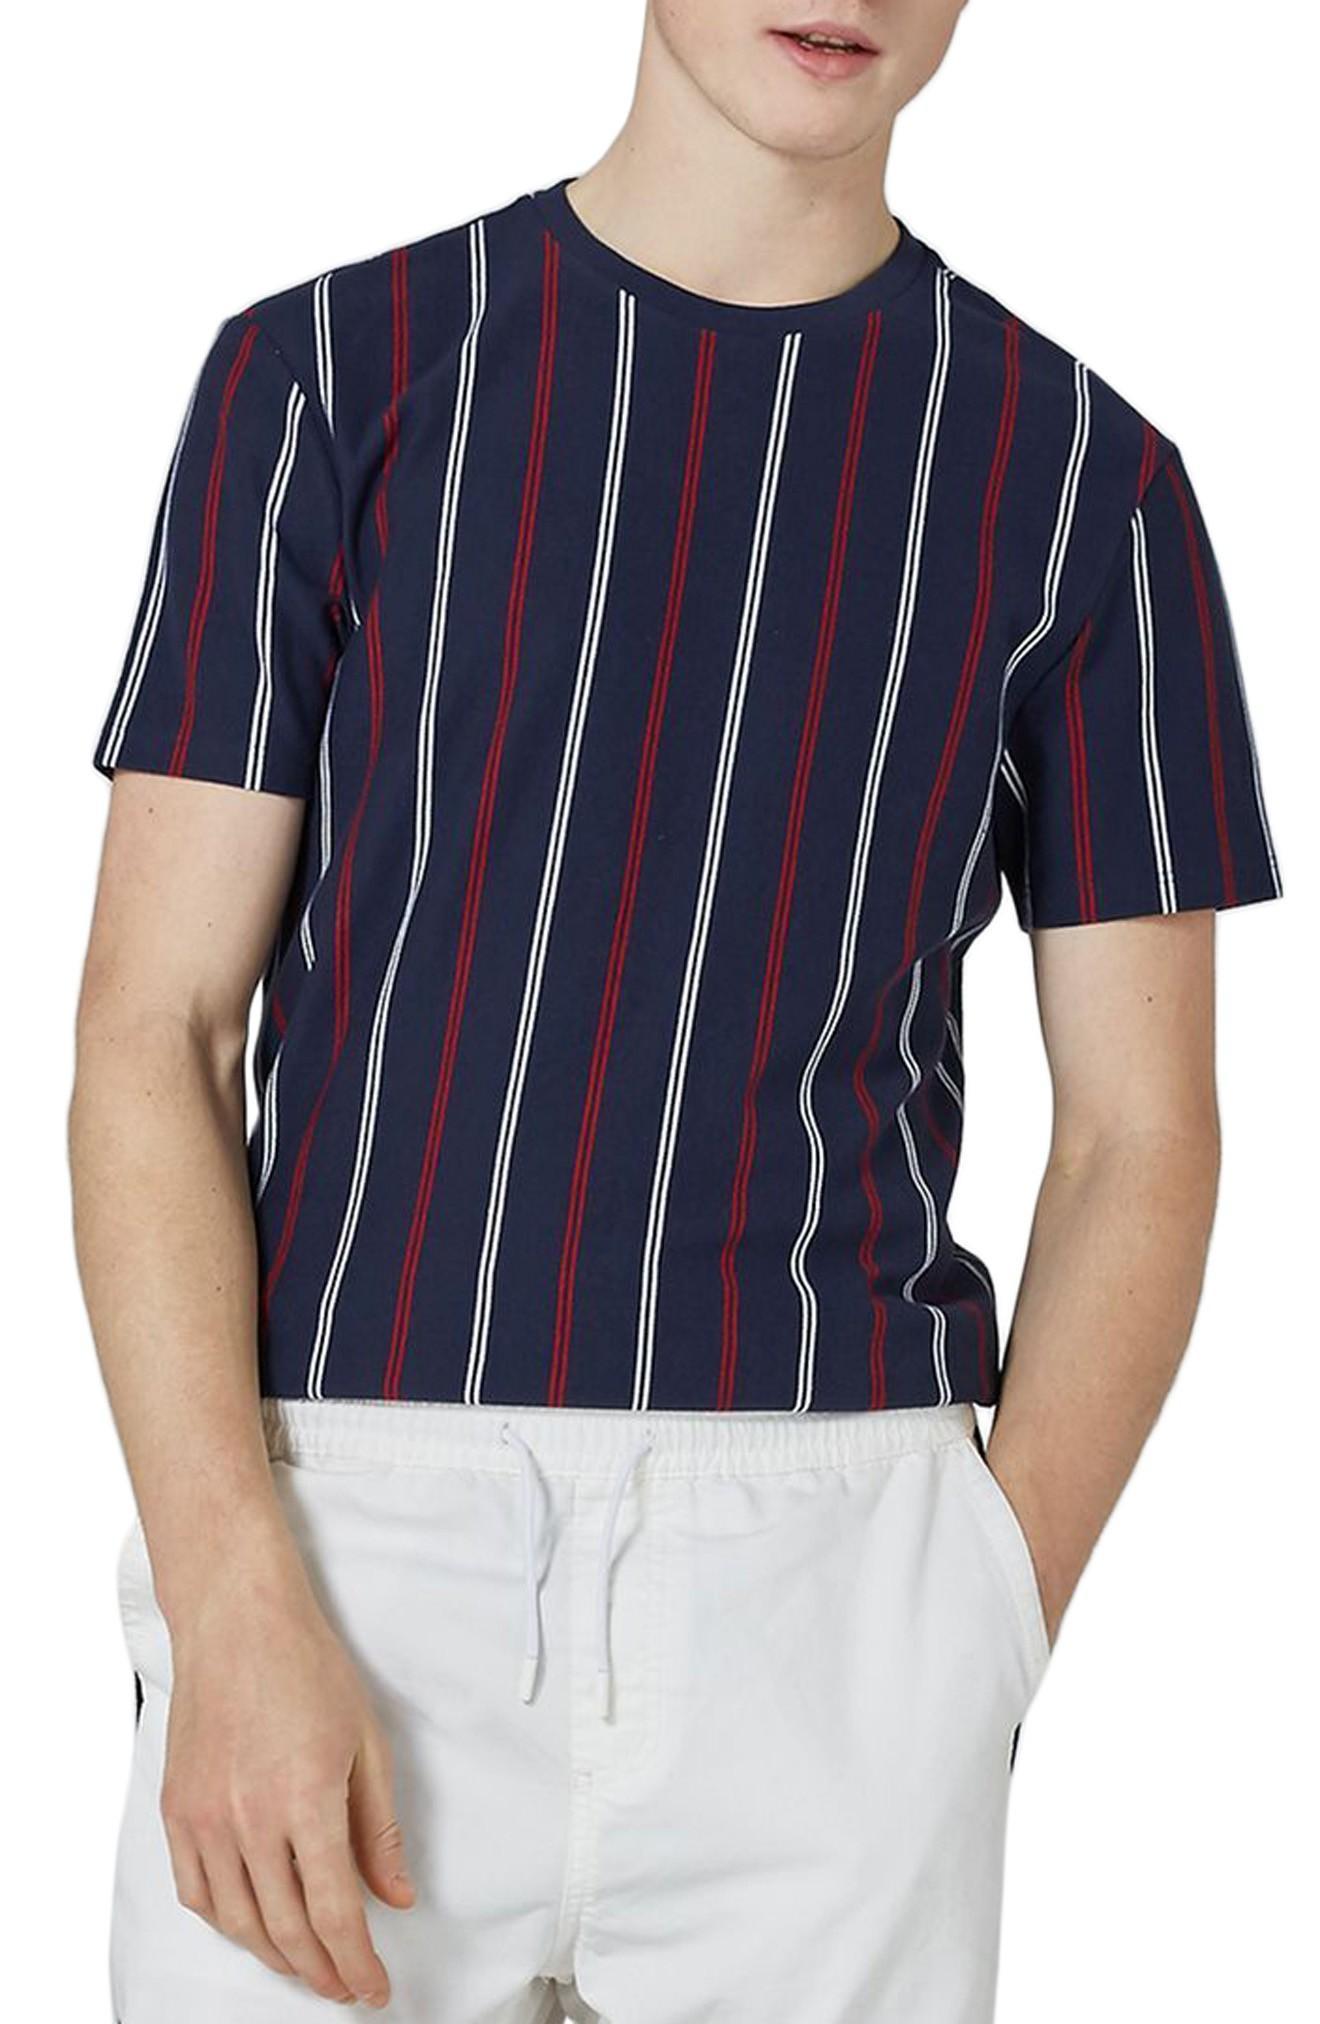 Topman Slim Fit Vertical Striped T-shirt In Dark Blue Multi